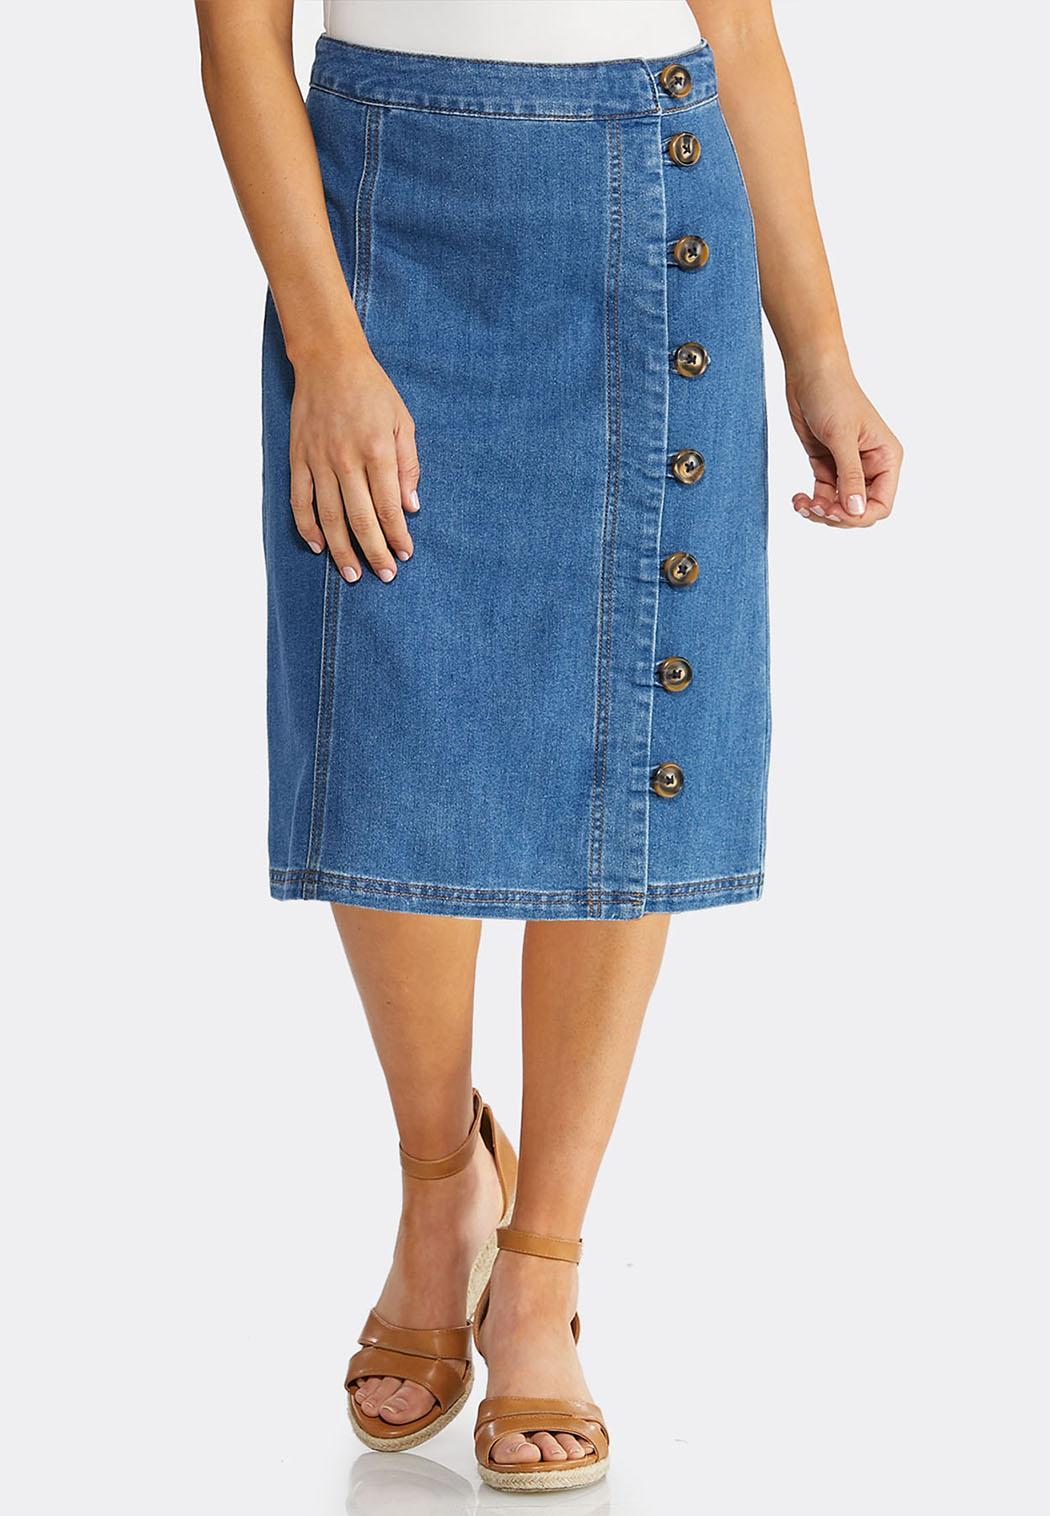 02201d23846 Plus Size Tortoise Button Denim Skirt Skirts Cato Fashions